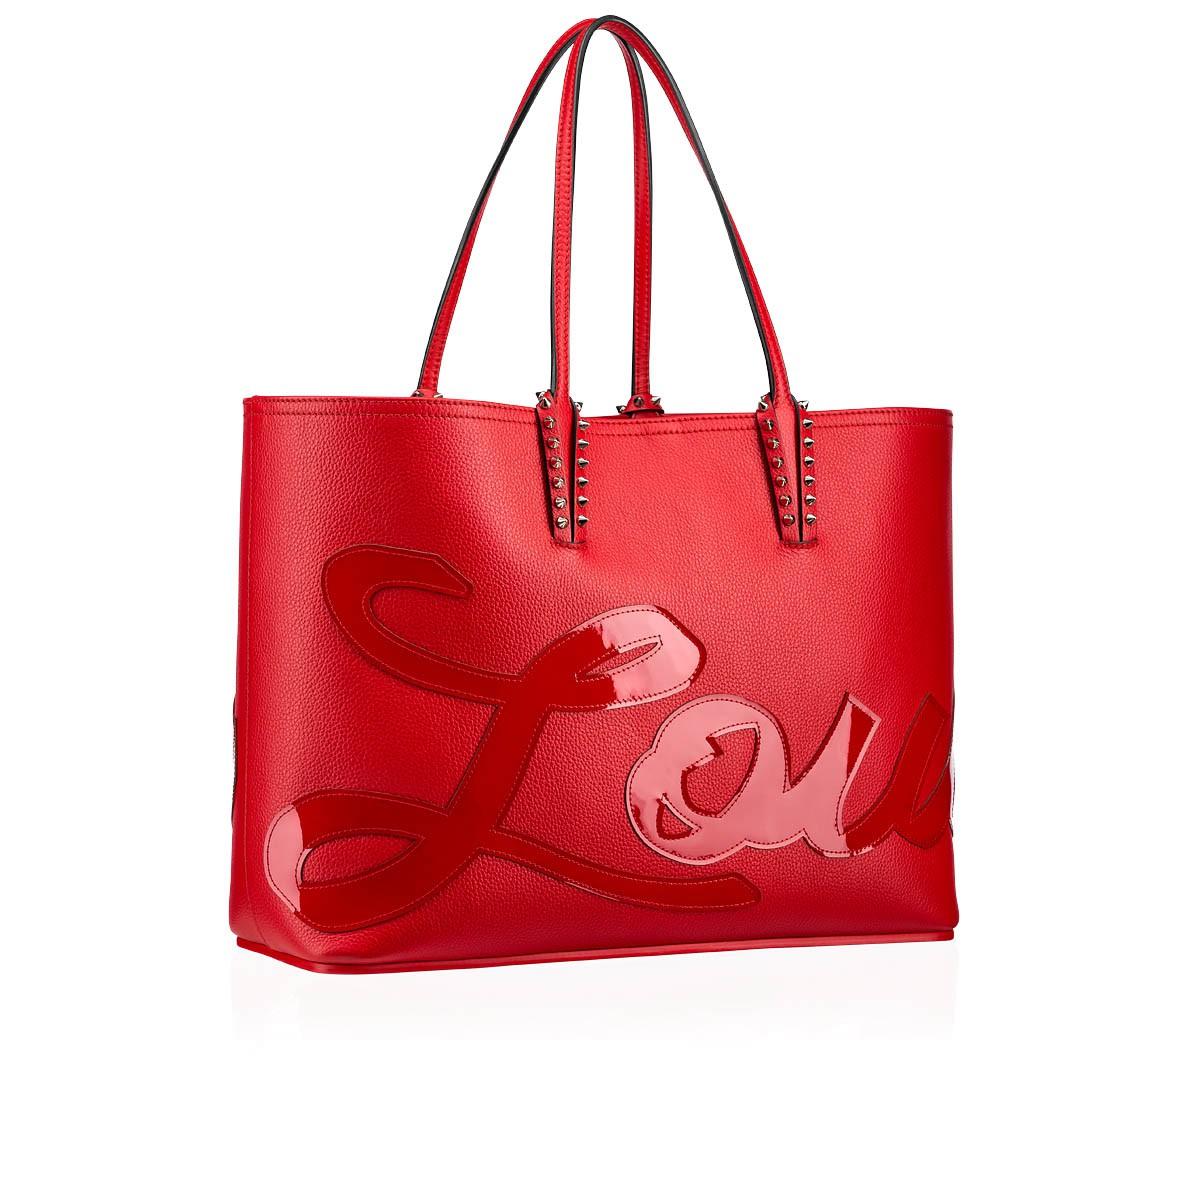 Bags - Cabata Logo Tote Bag - Christian Louboutin